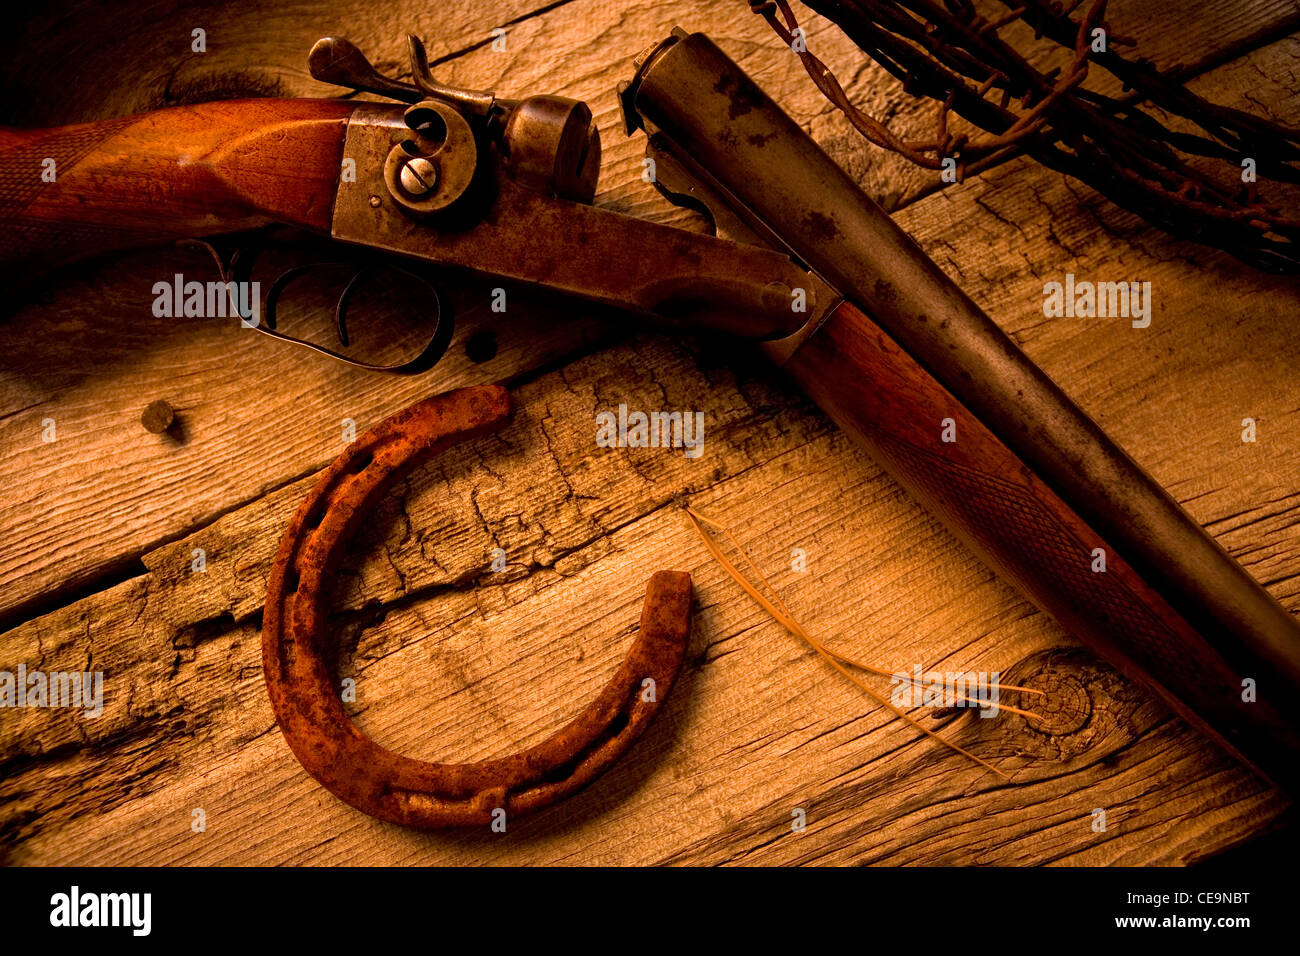 12 Gauge Shotgun Stock Photos & 12 Gauge Shotgun Stock